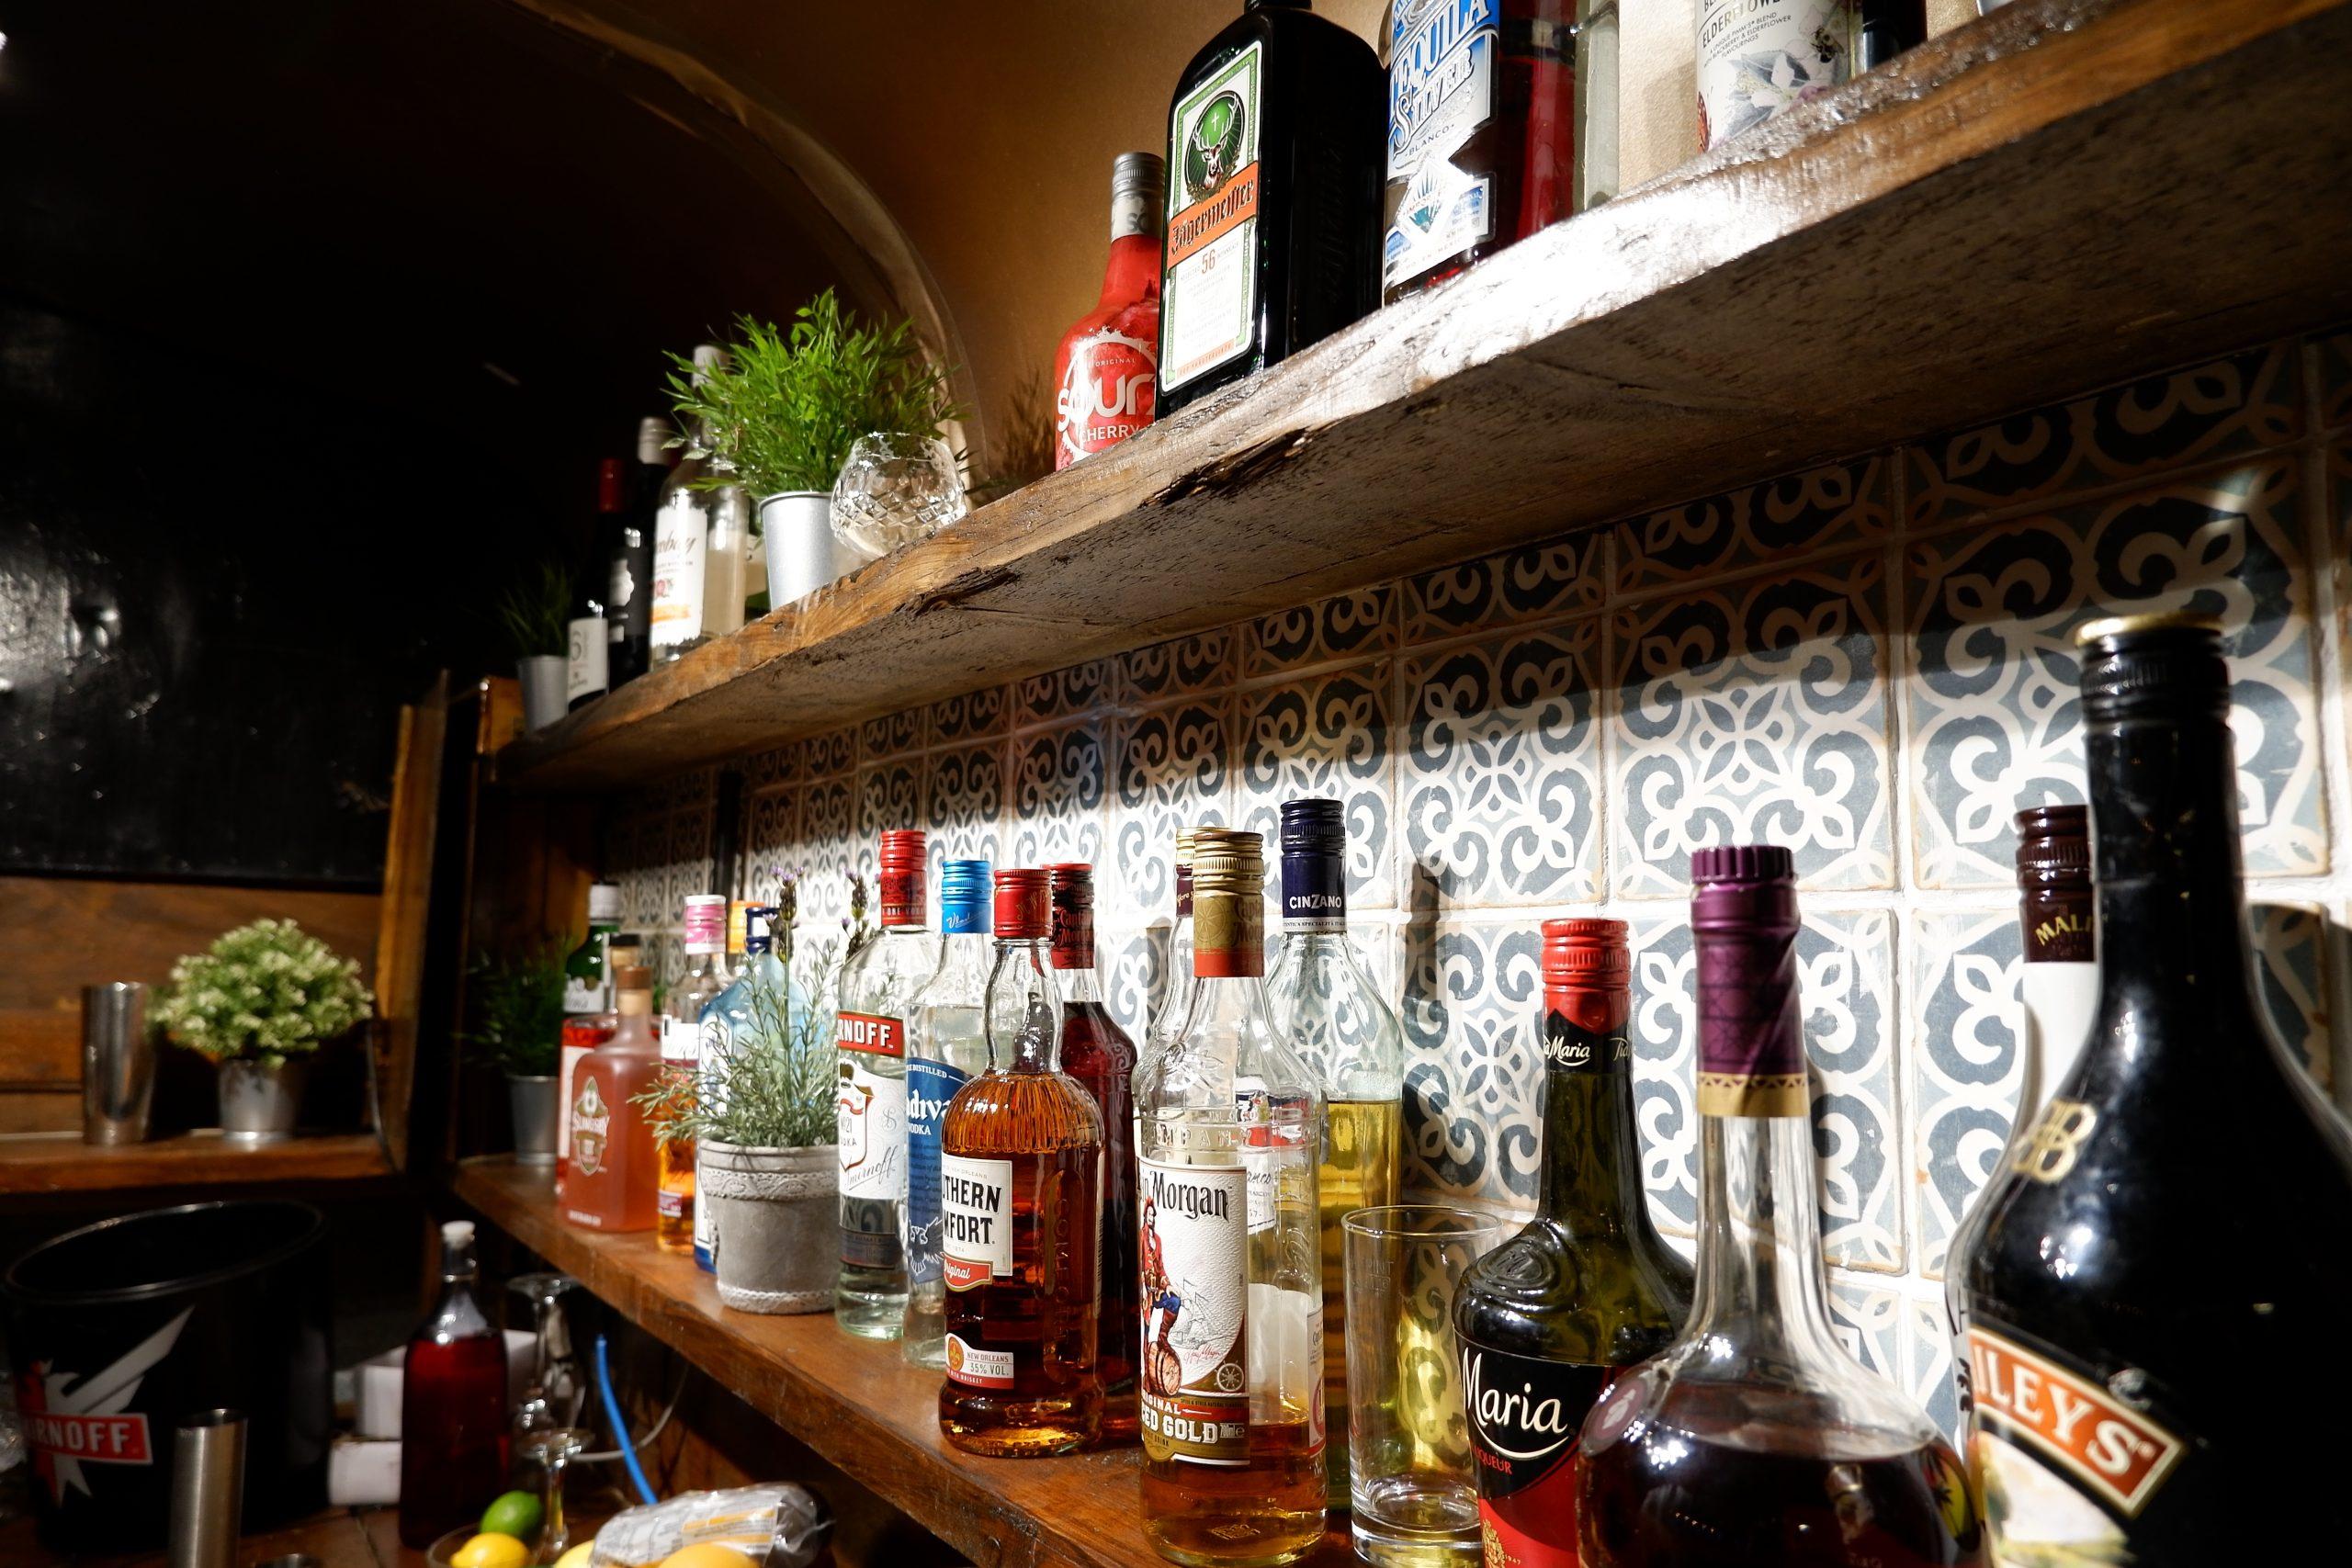 The Bespoke Bar Company